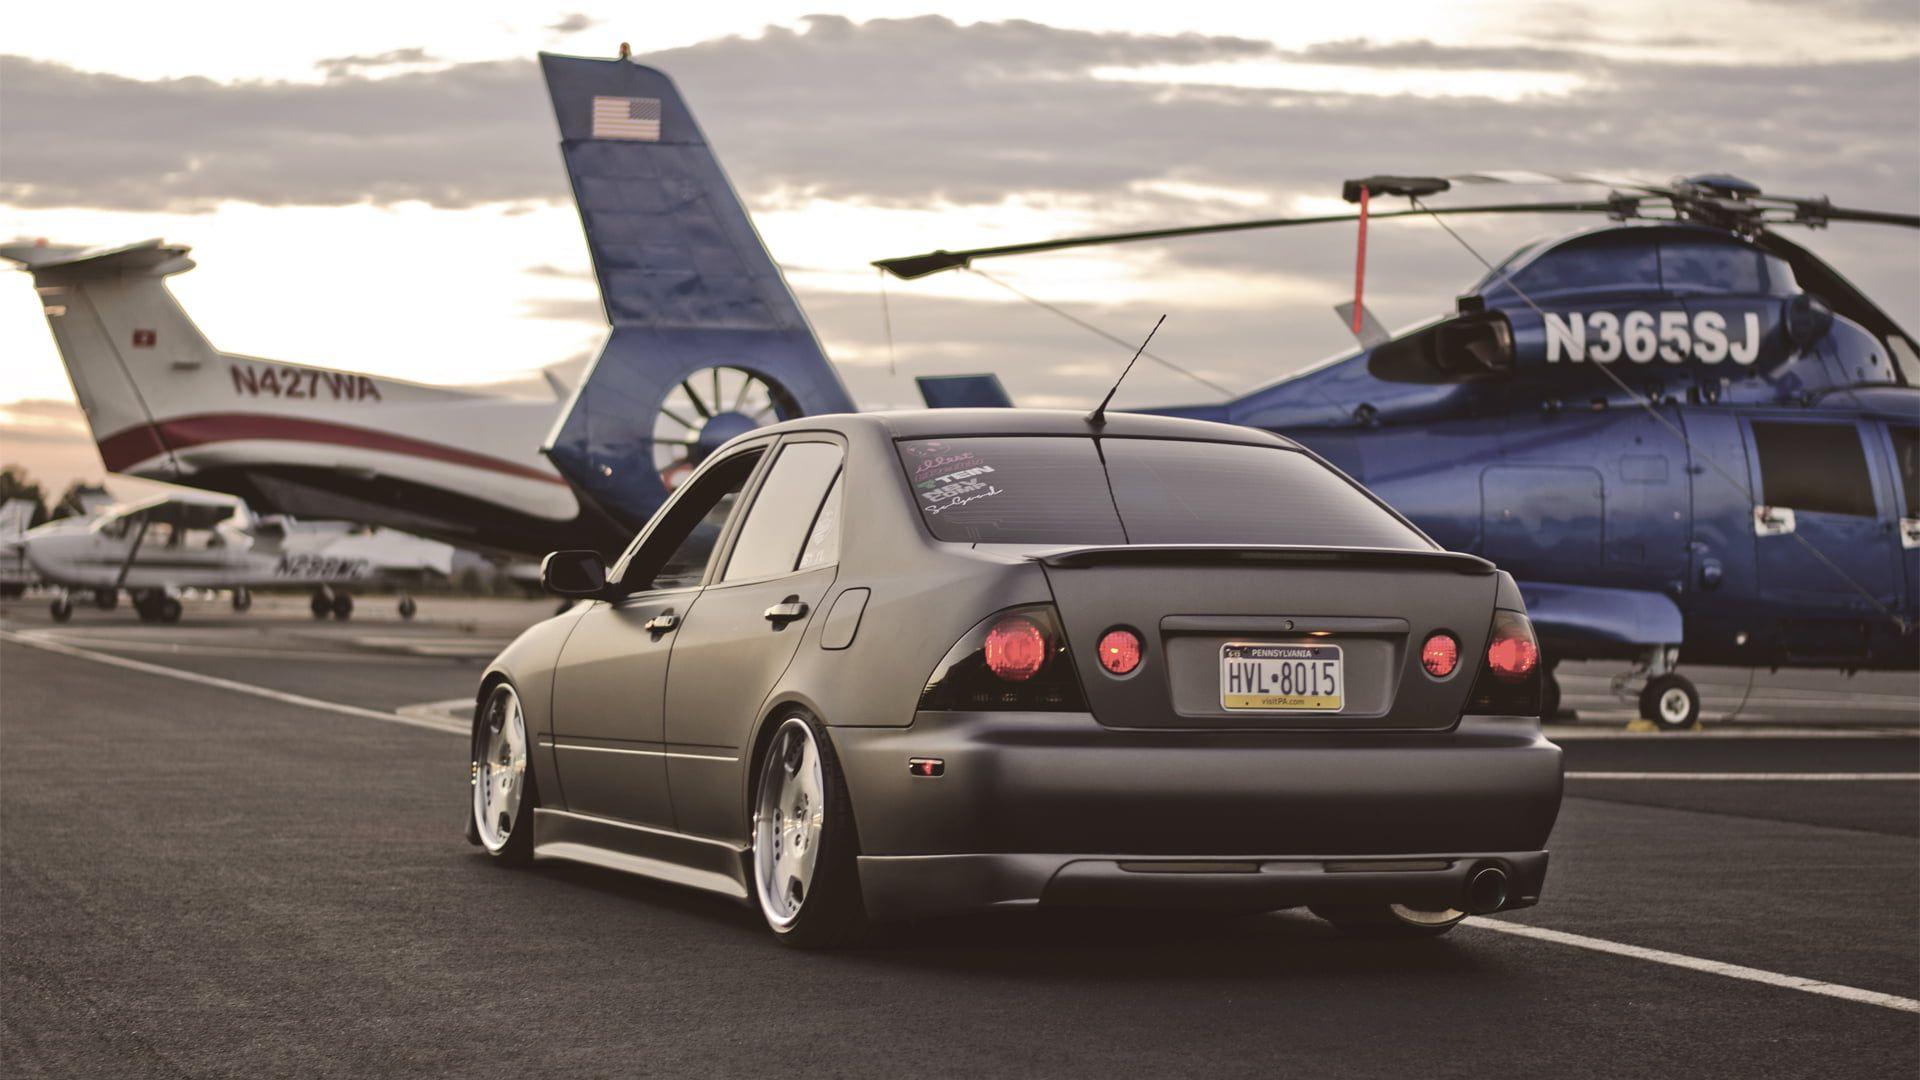 Black Sedan Helicopter Lexus Toyota Lexus Toyota Height Is300 Altezza 1080p Wallpaper Hdwallpaper Desktop In 2021 Lexus Is300 Lexus Sedan Lexus Cars